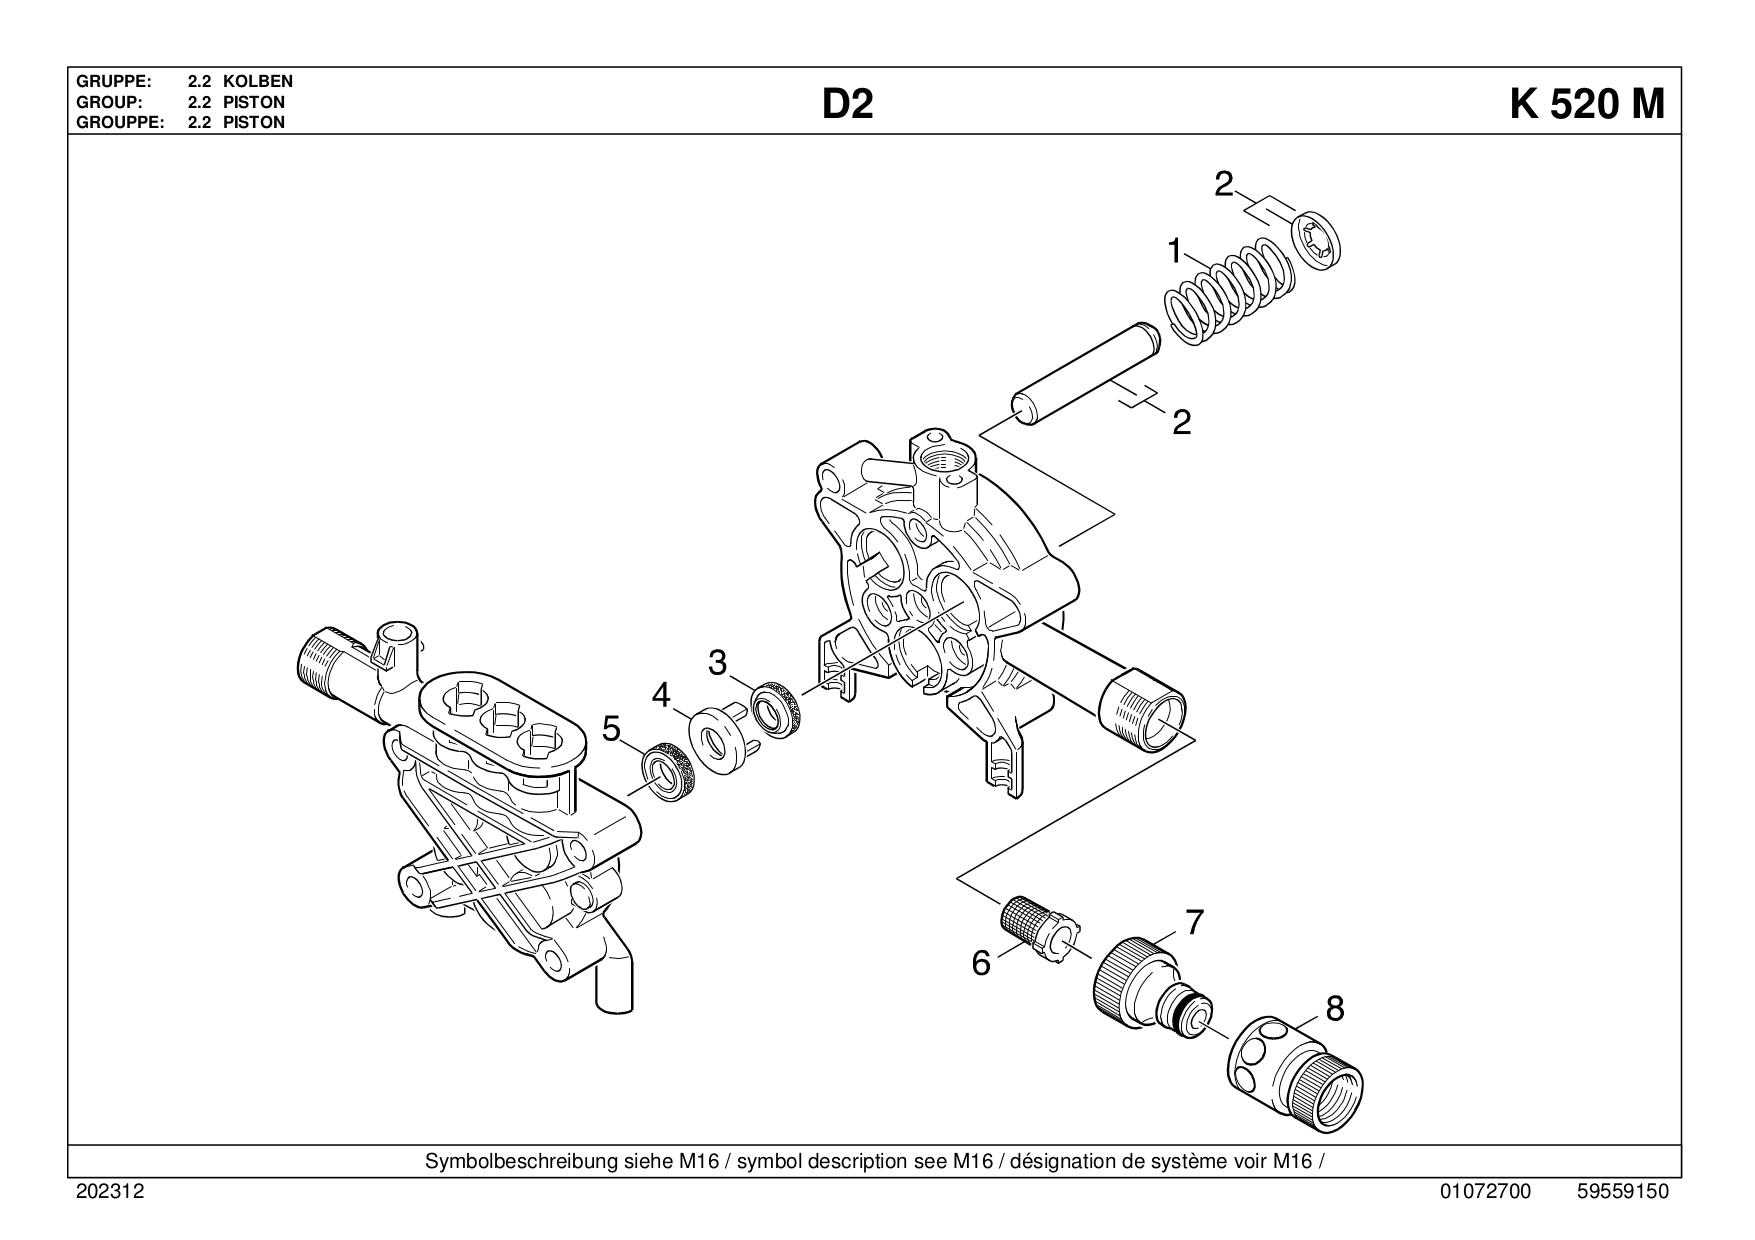 Karcher 330 m service Manual